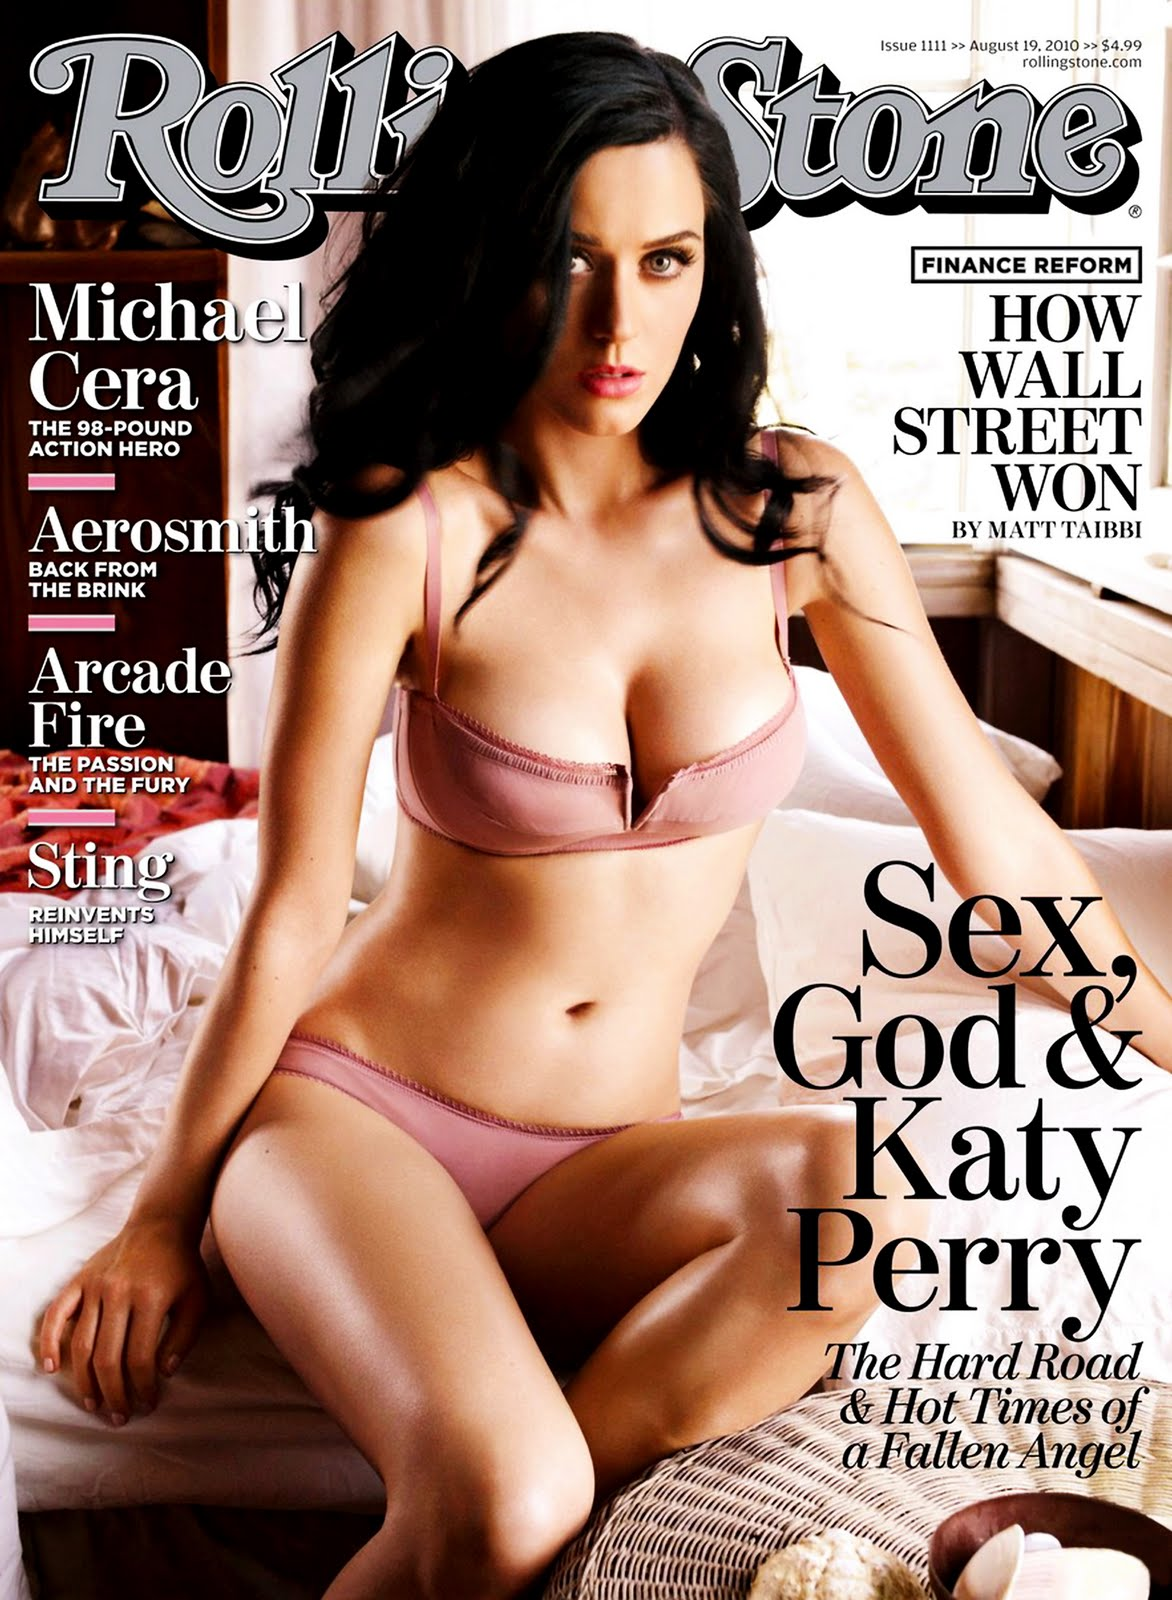 http://4.bp.blogspot.com/_8oDQ4L3GuN8/TFjbY9ni6WI/AAAAAAAADyU/lpHxQYmRooQ/s1600/Katy_Perry_Rolling_Stone_Magazine_Cover_Girls.jpg